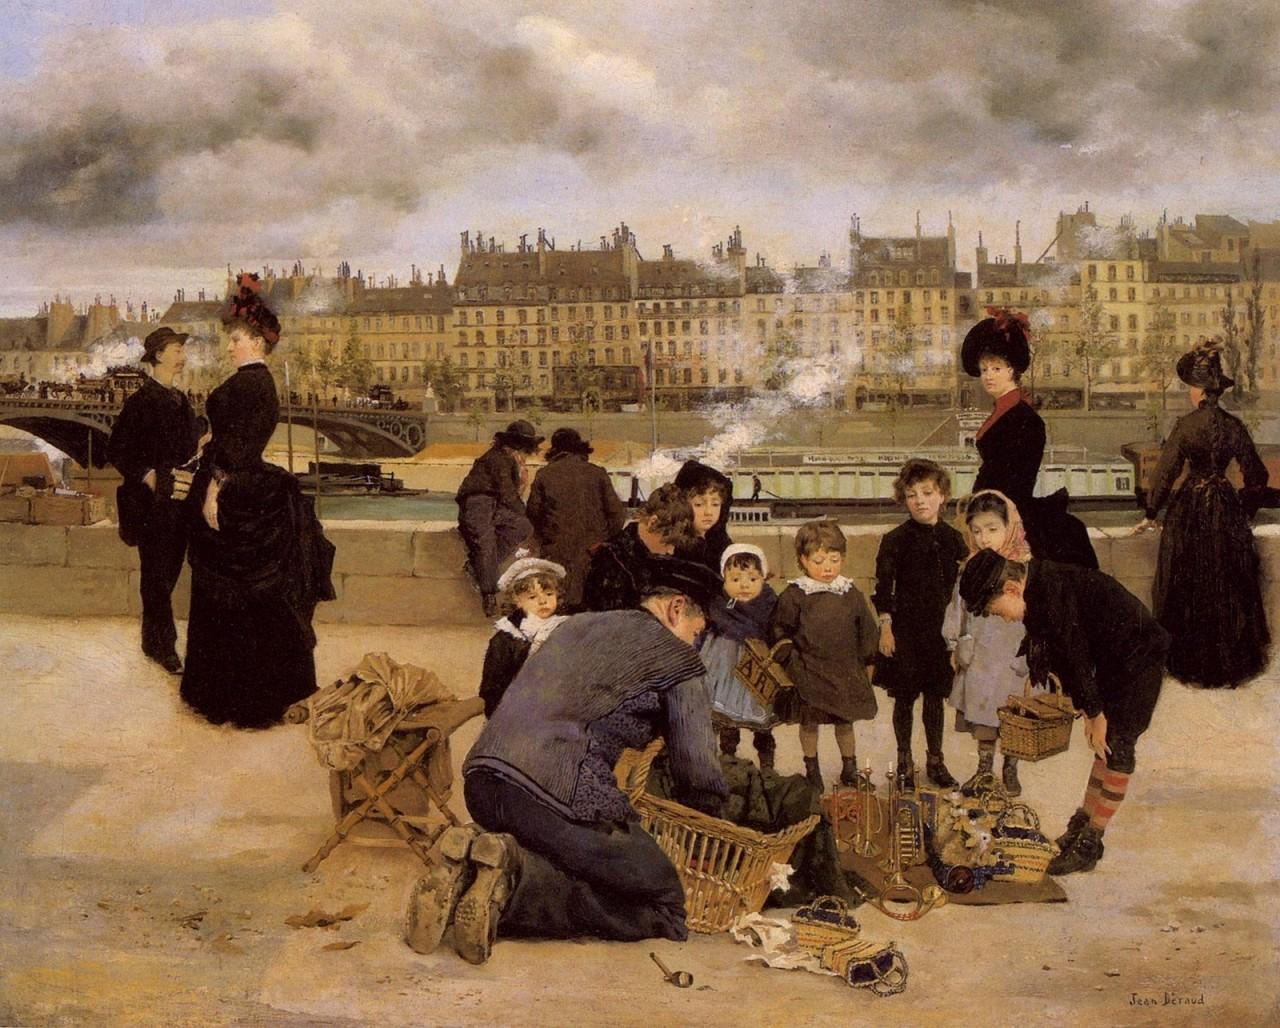 Жан Беро (Jean Béraud), 1848-1935